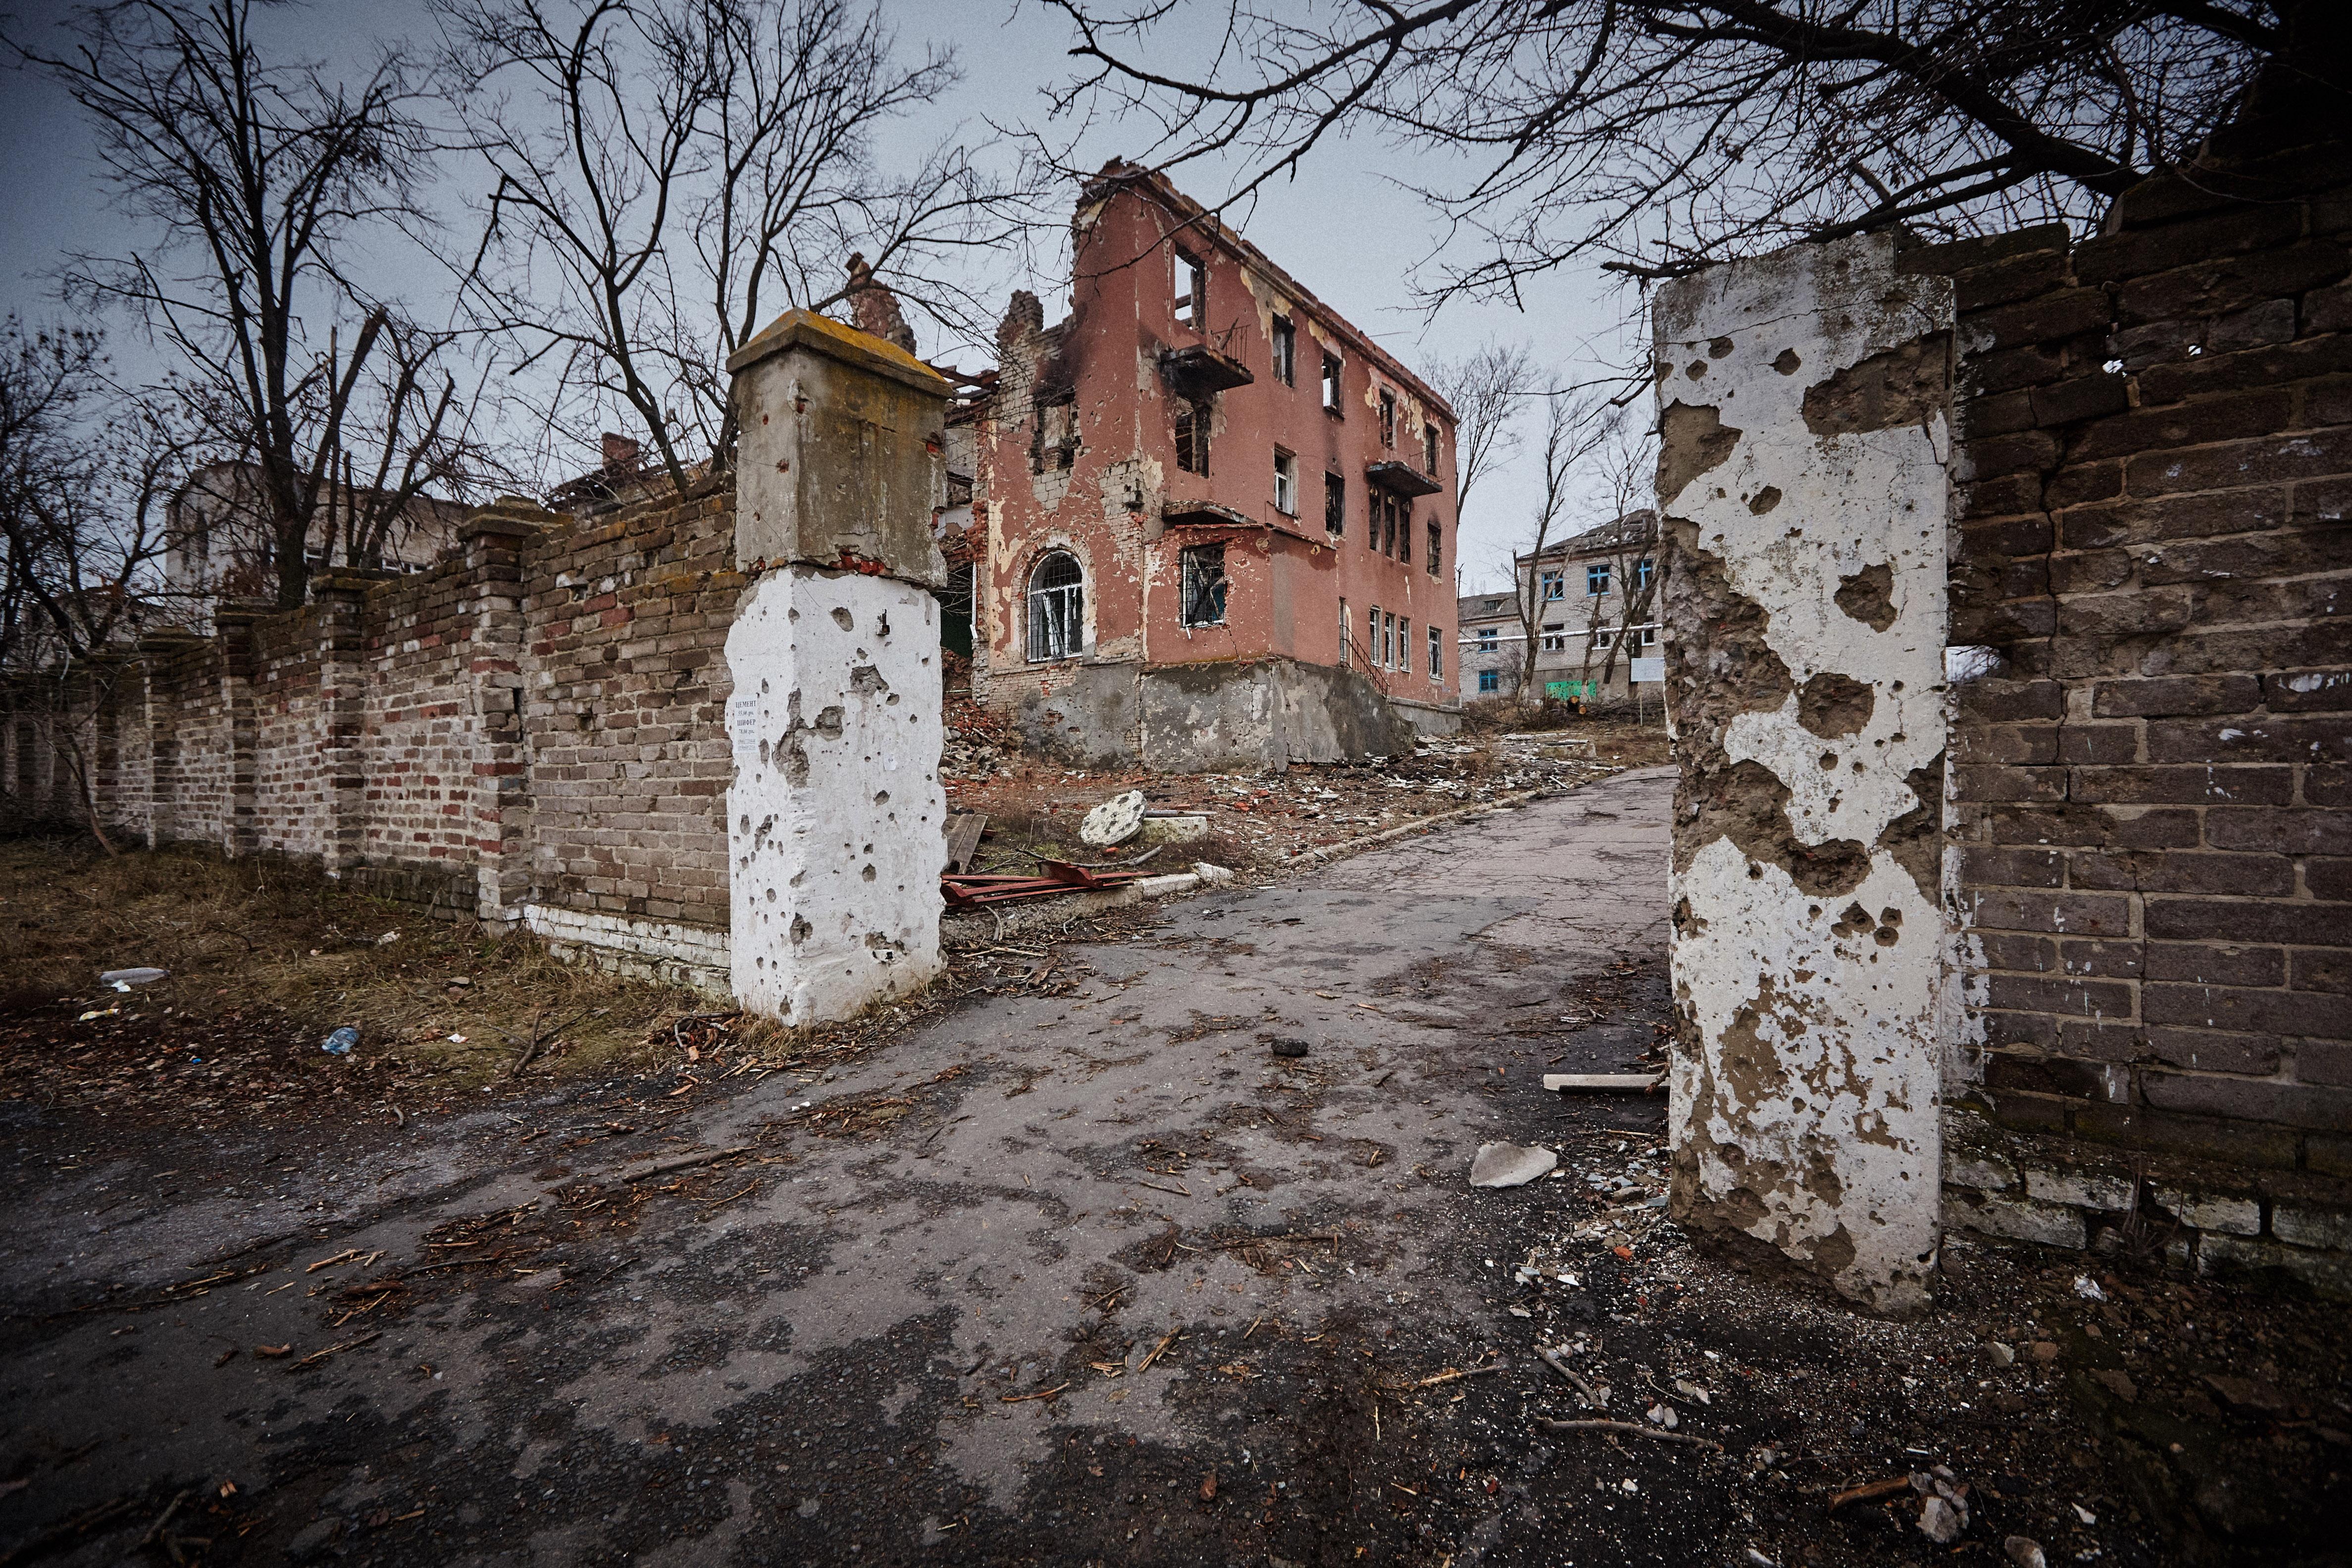 Historic Buildings In Dover, N.J. Destroyed By 'Devastating' Fire